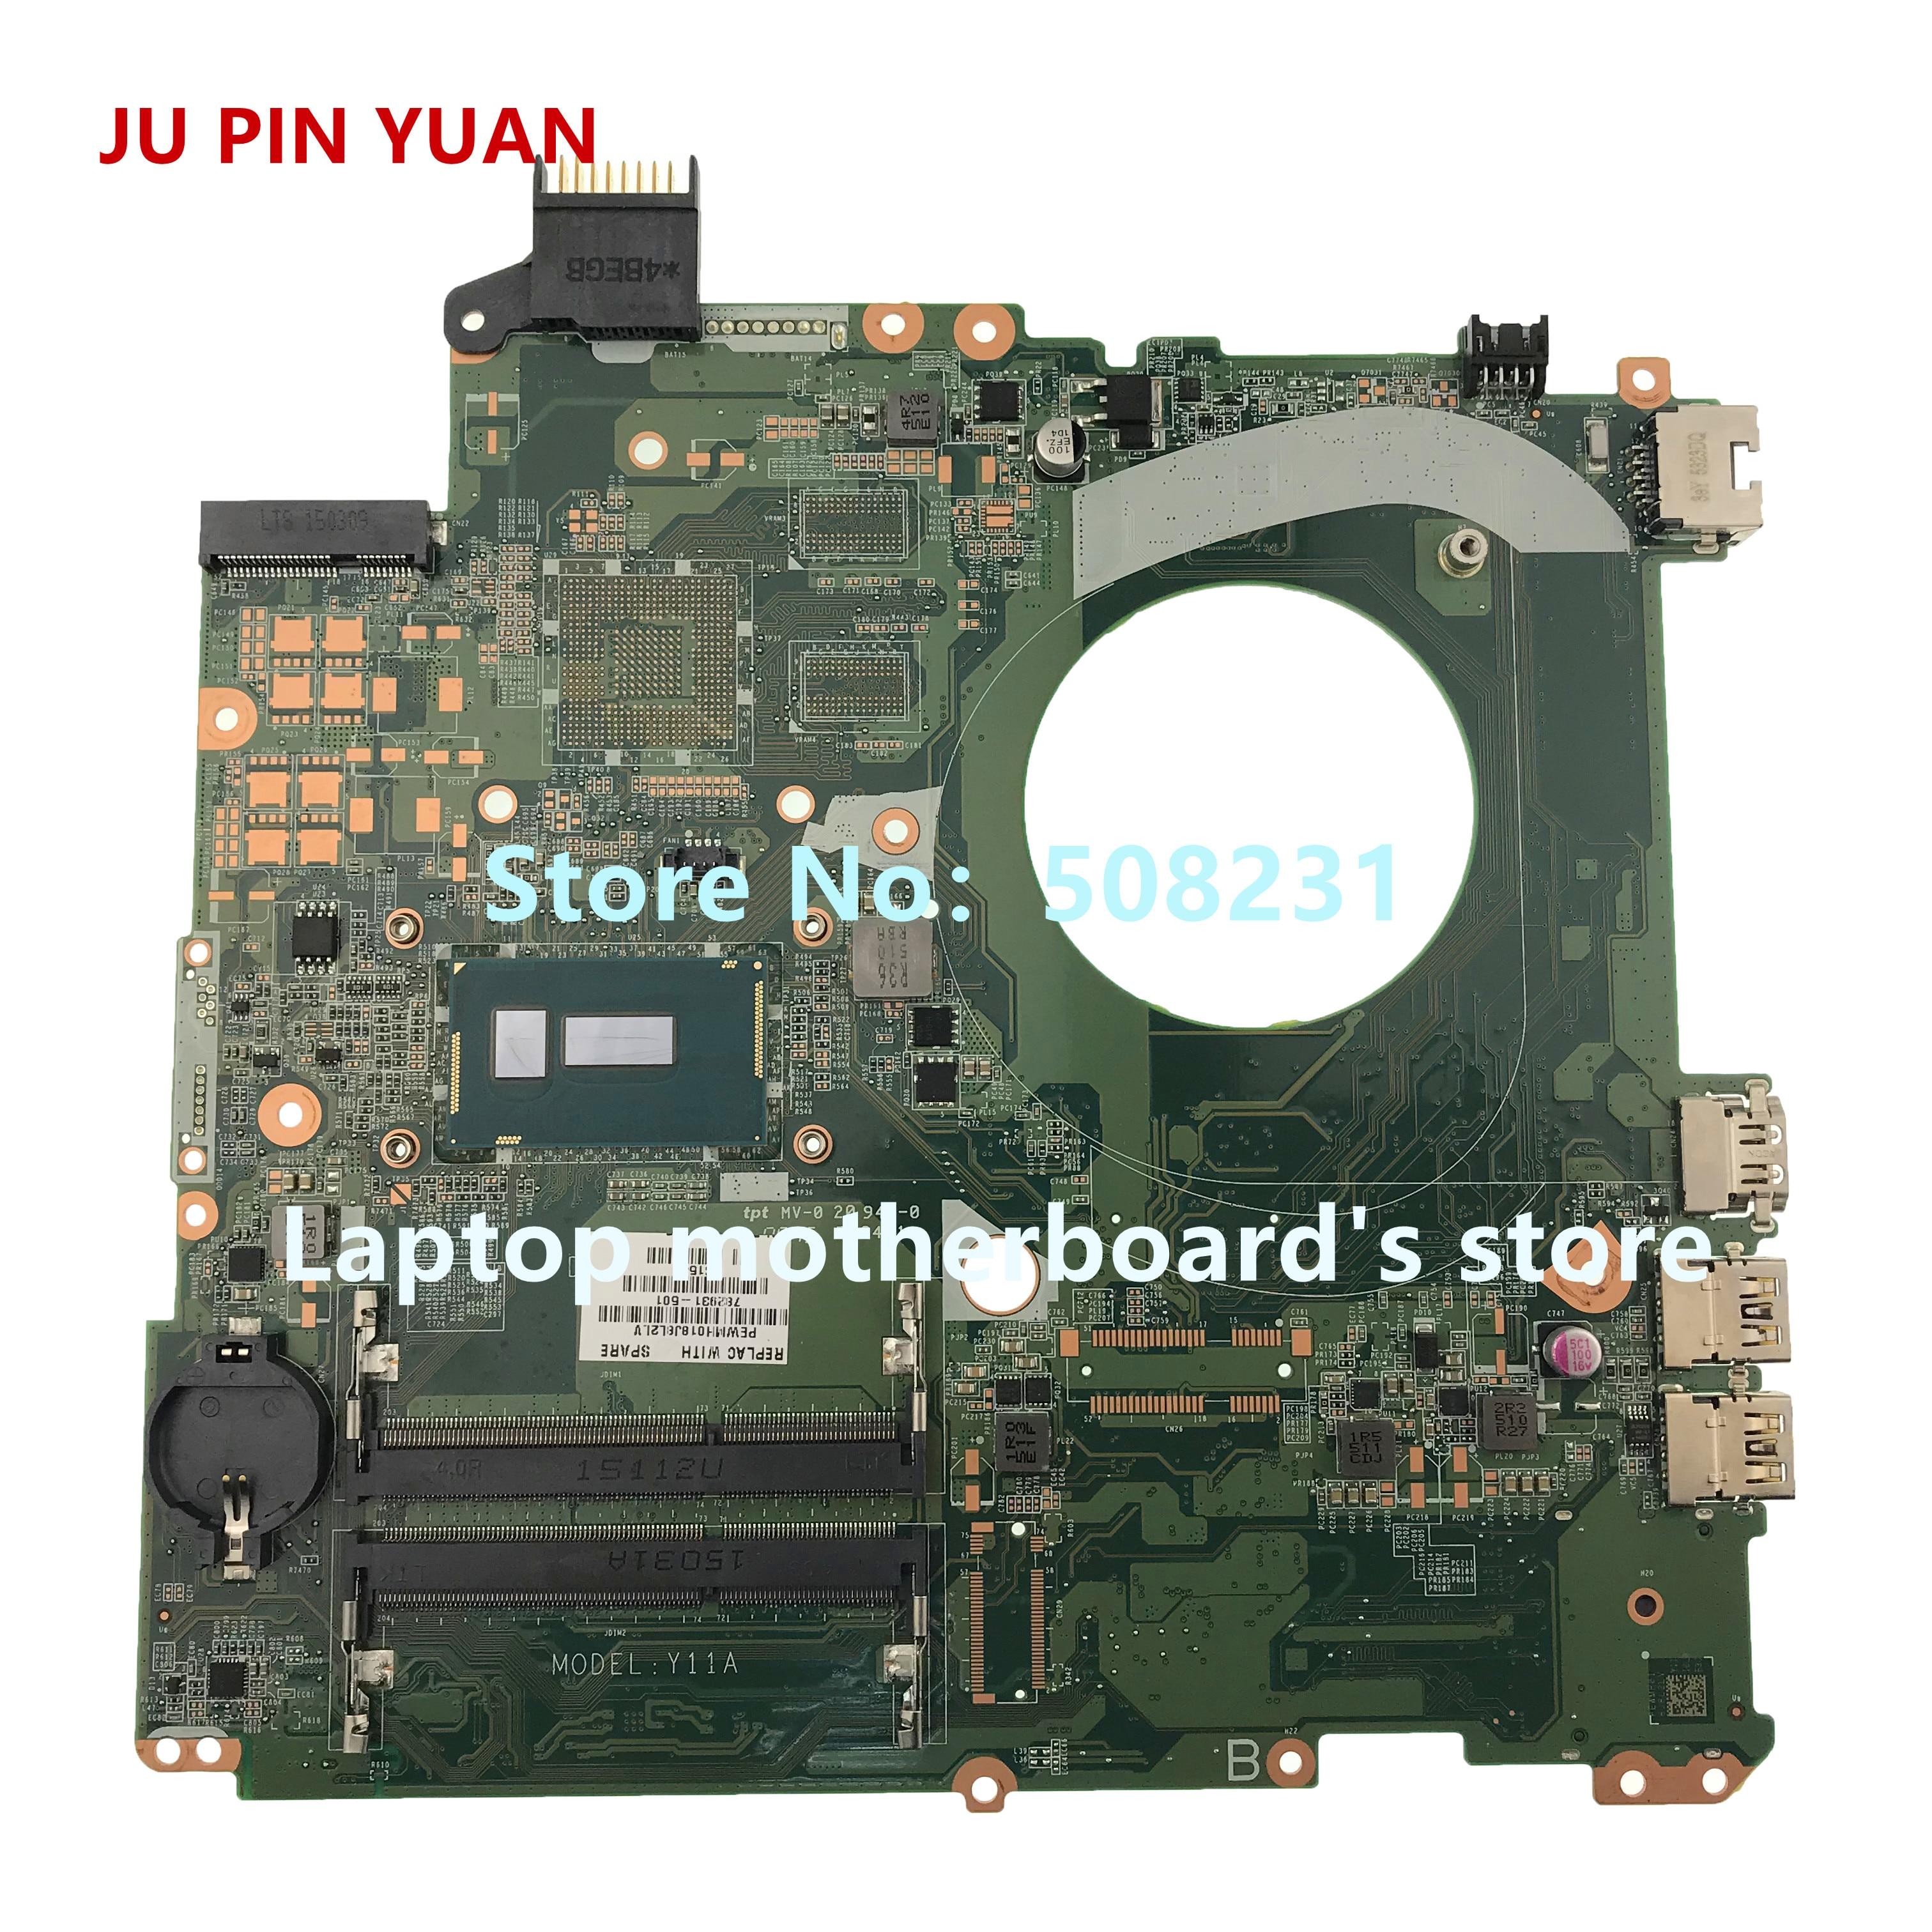 Computer & Büro Laptop Motherboard 2019 Mode Ju Pin Yuan 782931-501 Mainboard Für Hp Pavilion 15-p 15t-p Laptop Motherboard 782931-601 782931-001 Day11amb6e0 Mit I5-5200u Aromatischer Geschmack